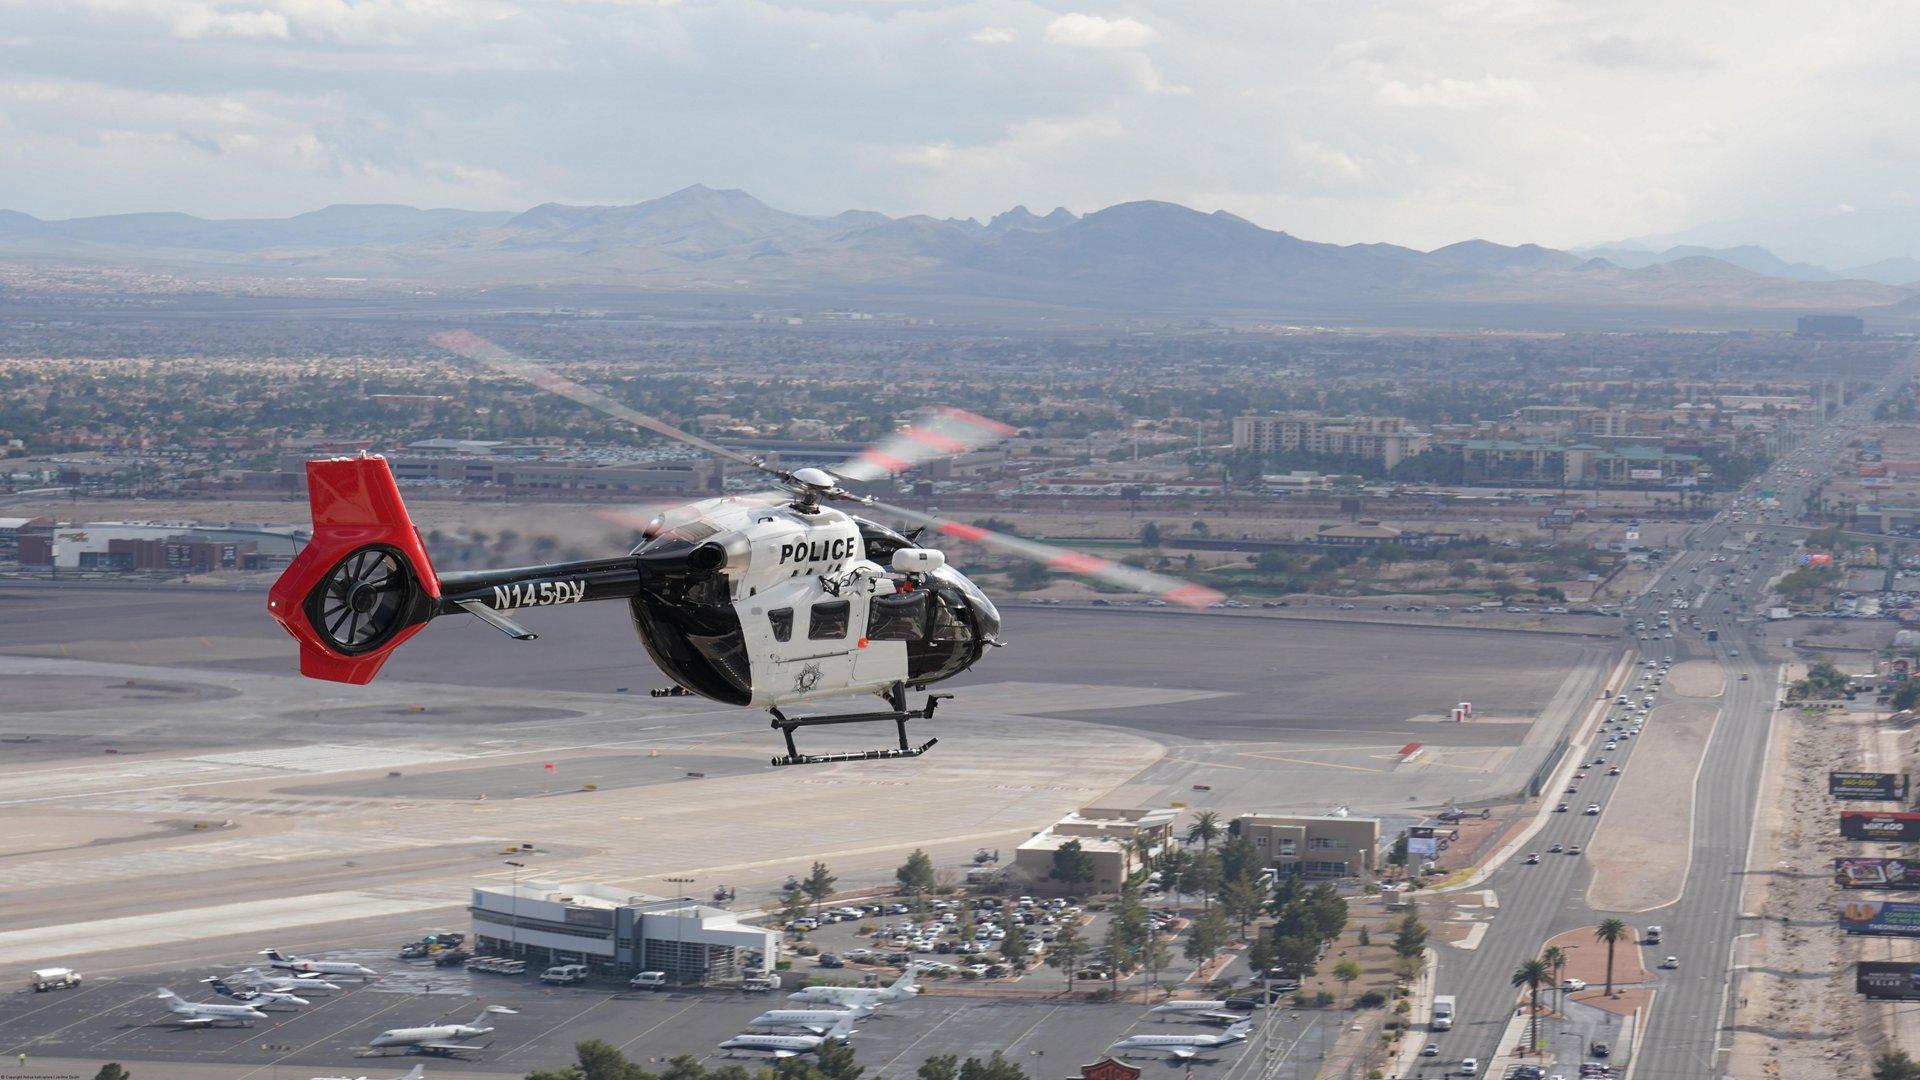 H145 Las Vegas Metropolitan Police Department 3